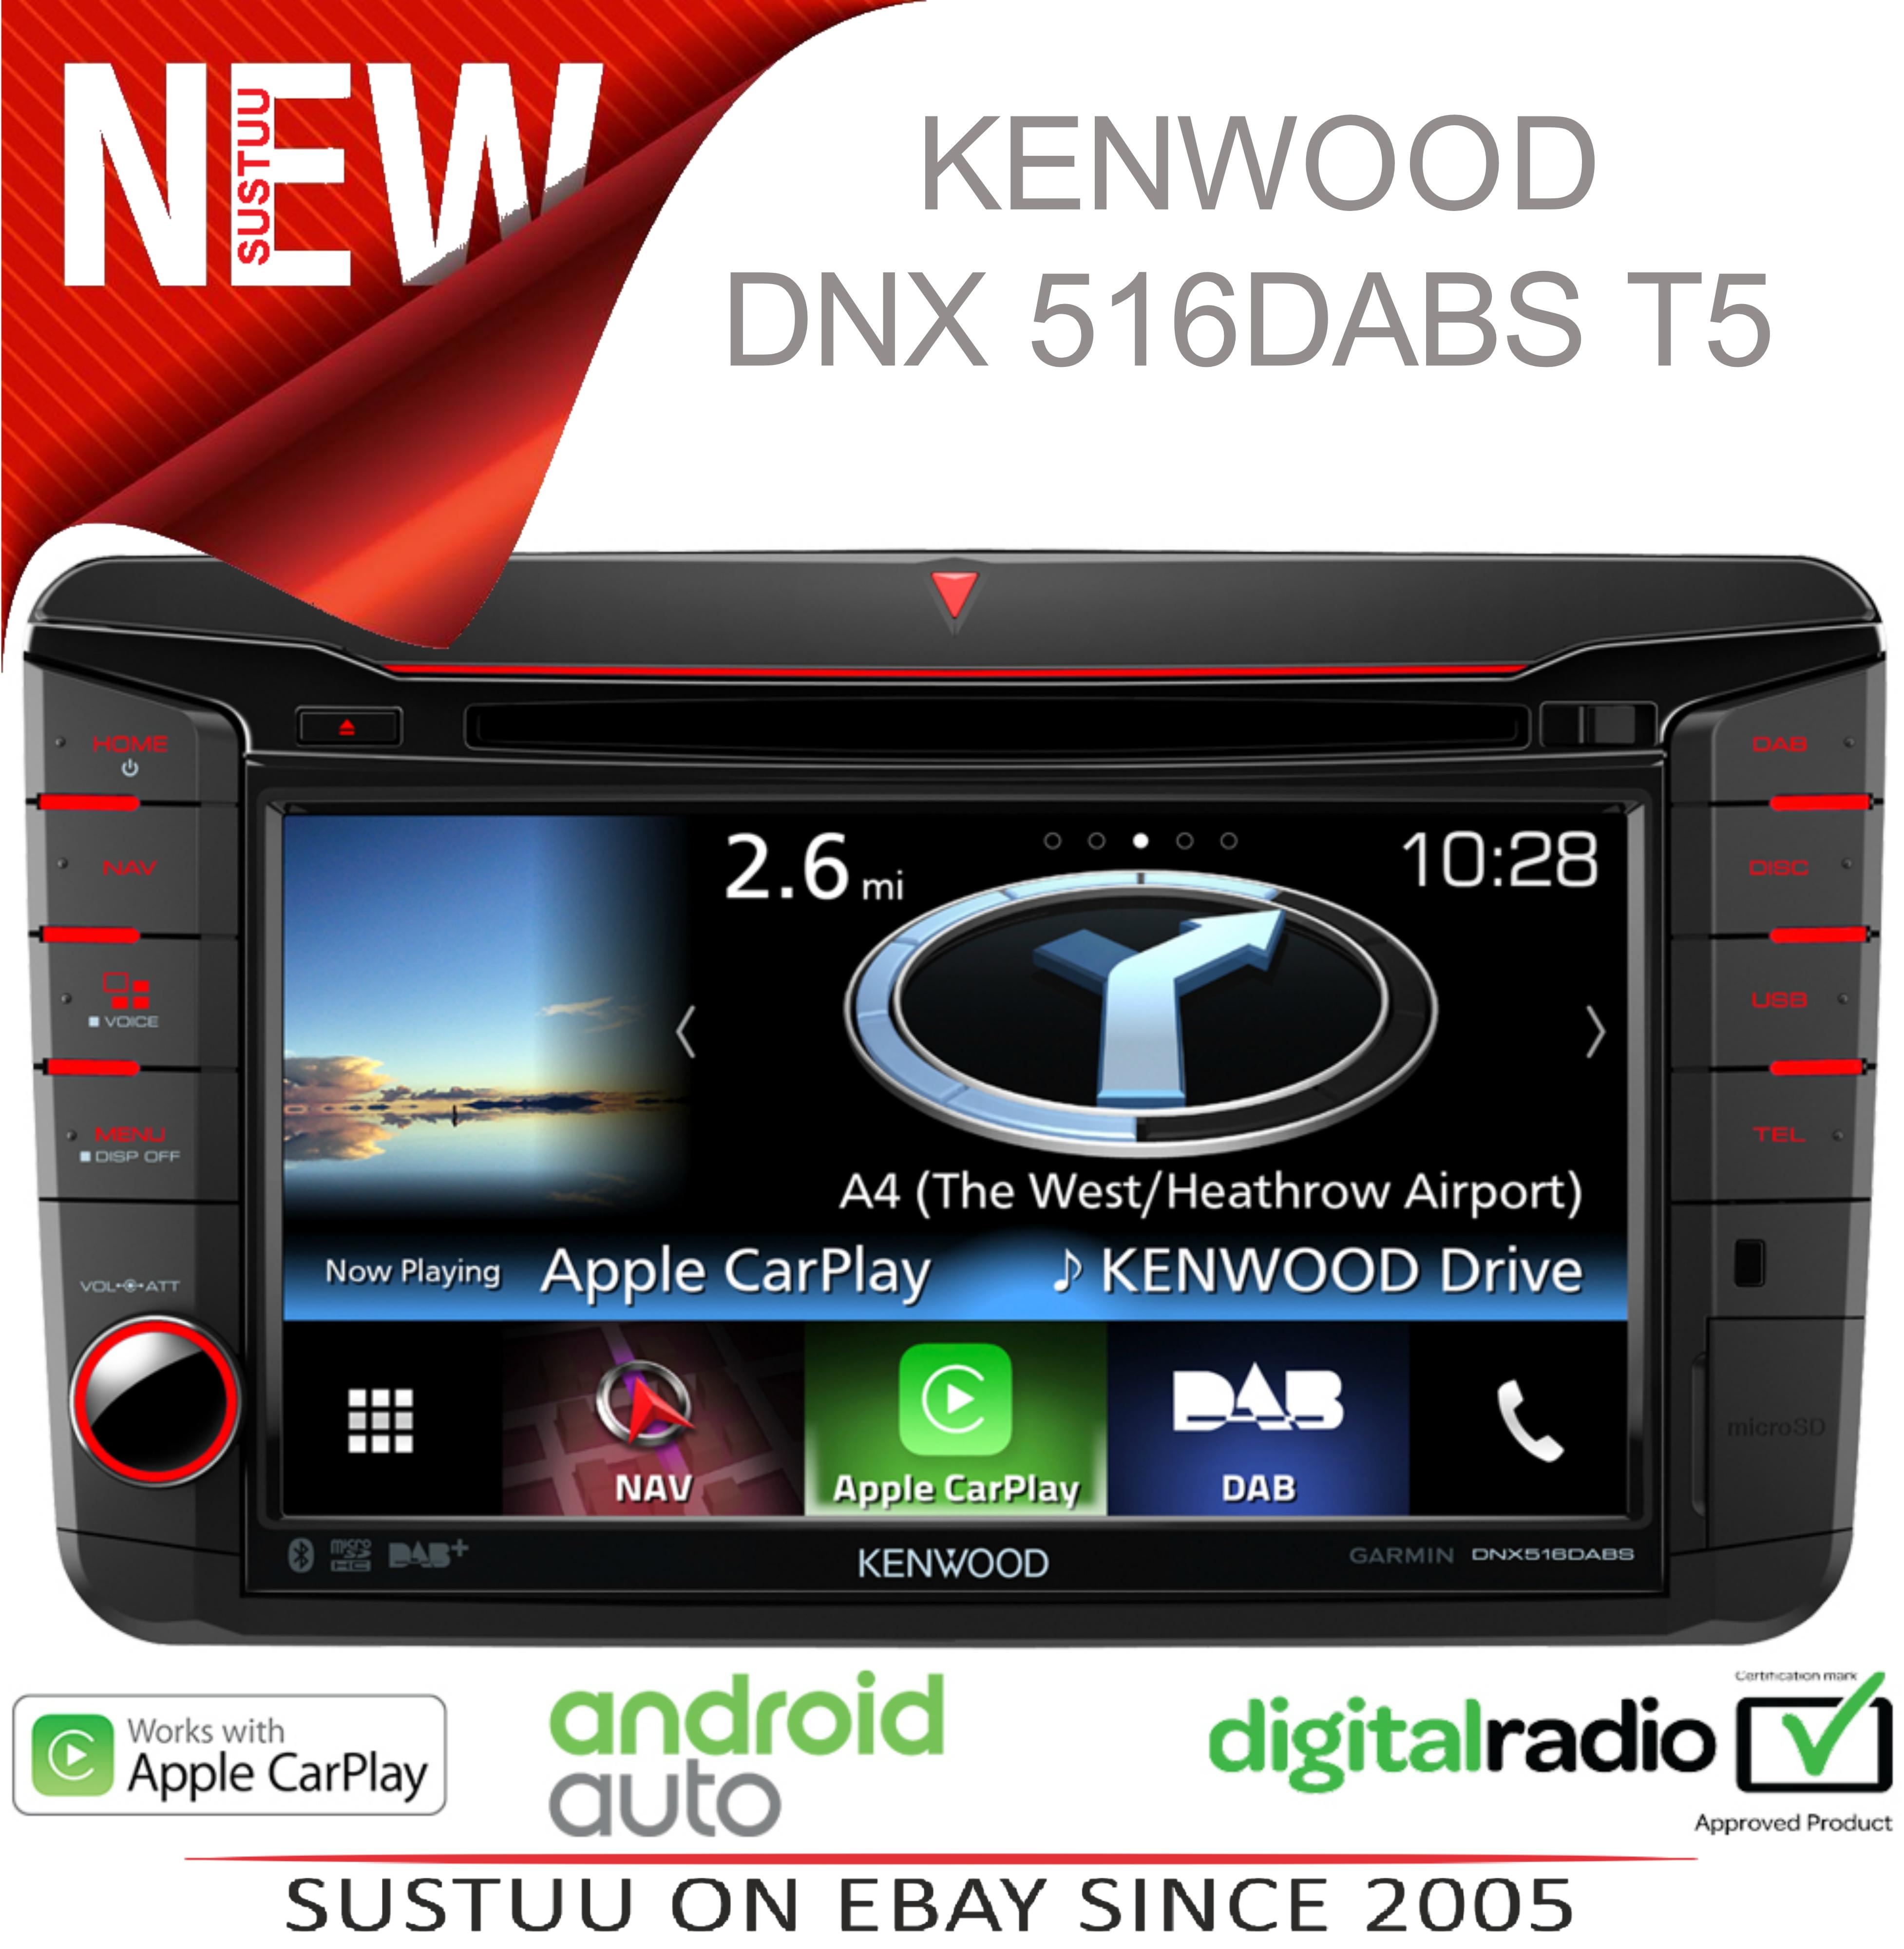 kenwood 7 car stereo gps satnav dab radio usb bluetooth. Black Bedroom Furniture Sets. Home Design Ideas